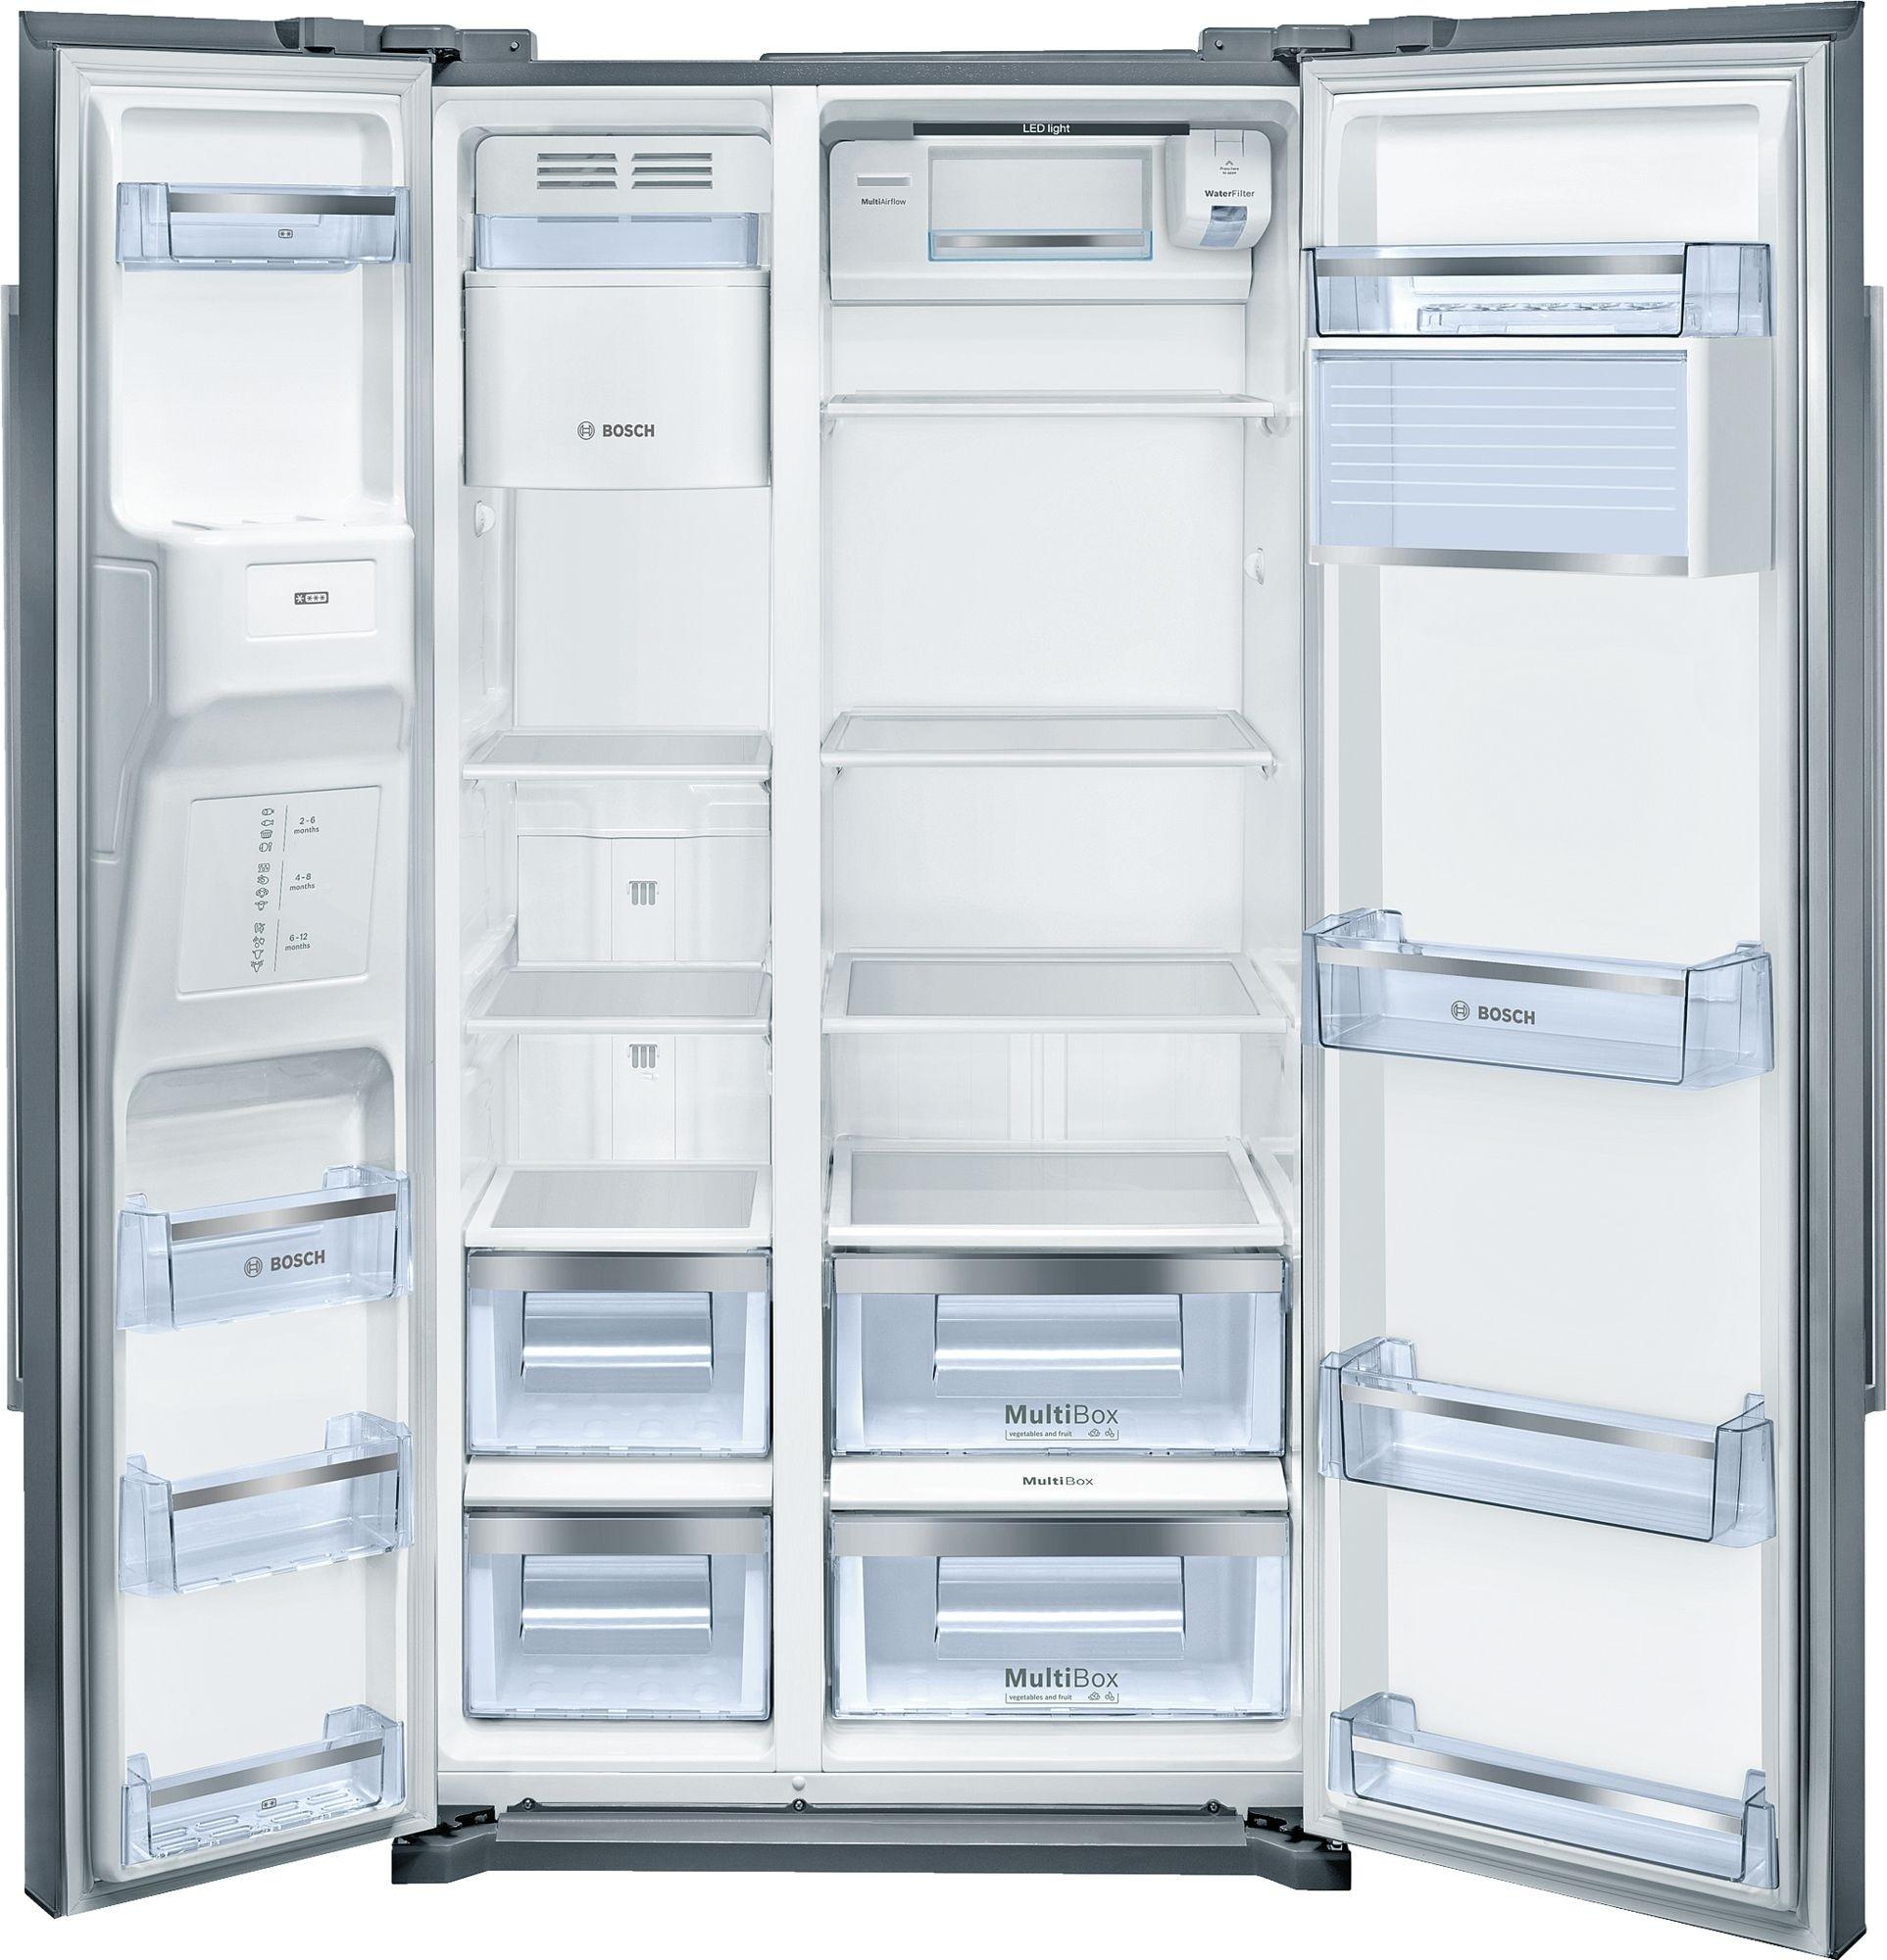 Bosch KAD90VB20G Fridge Freezer